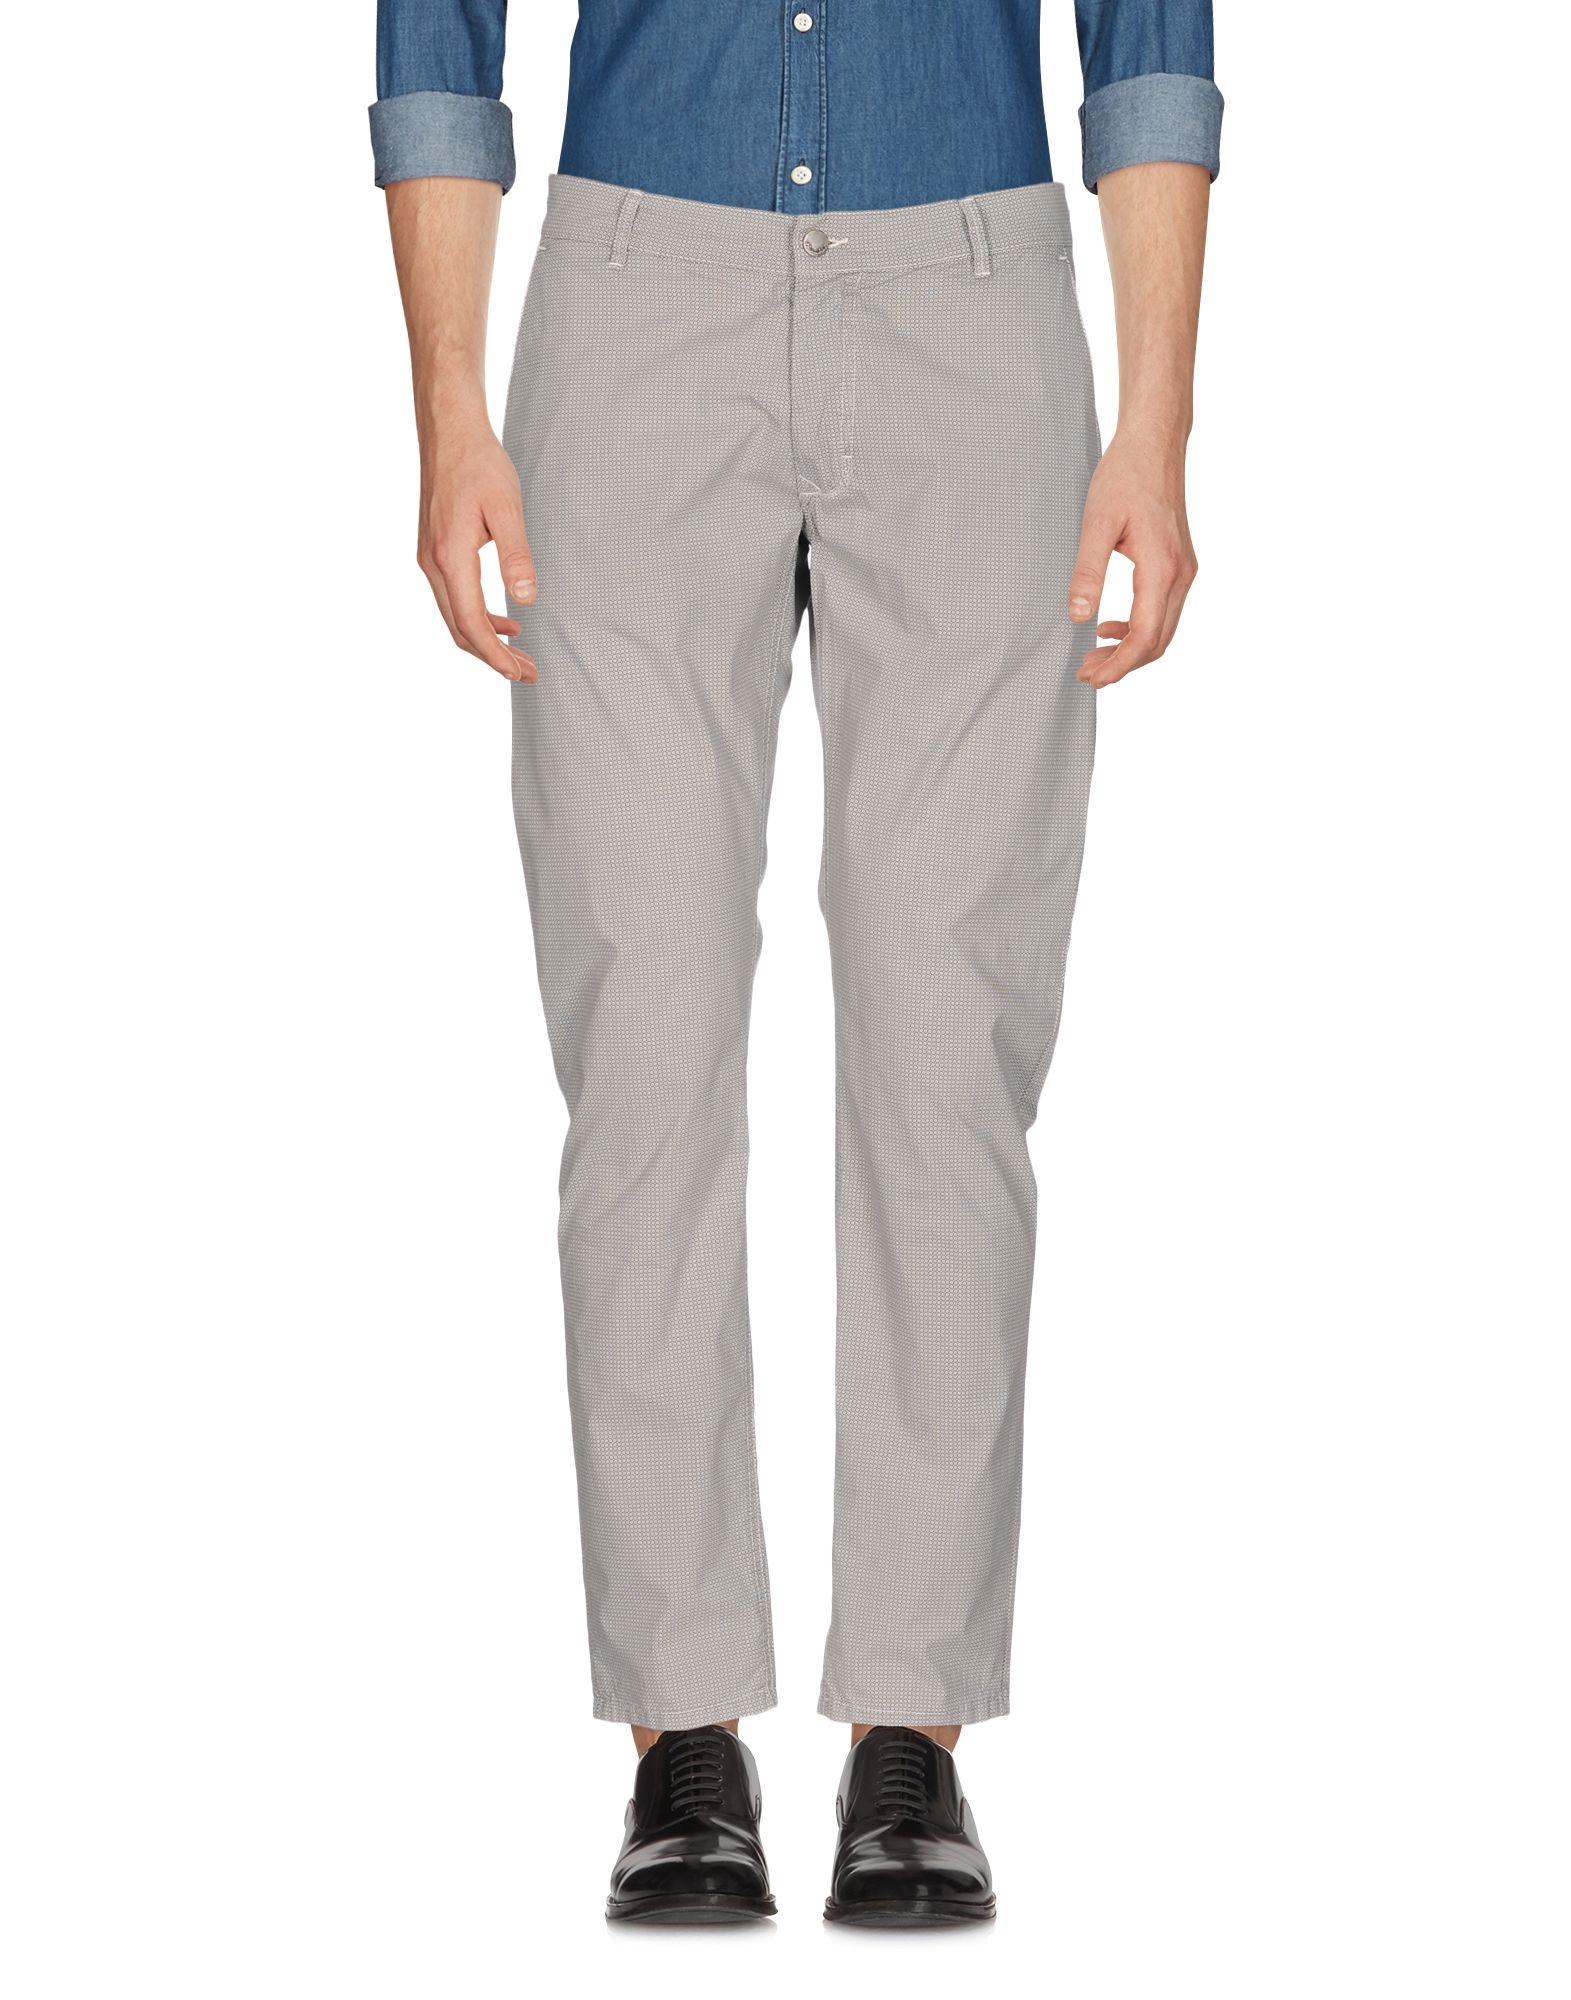 Pantalone grau Daniele Alessandrini herren - 13101736CE